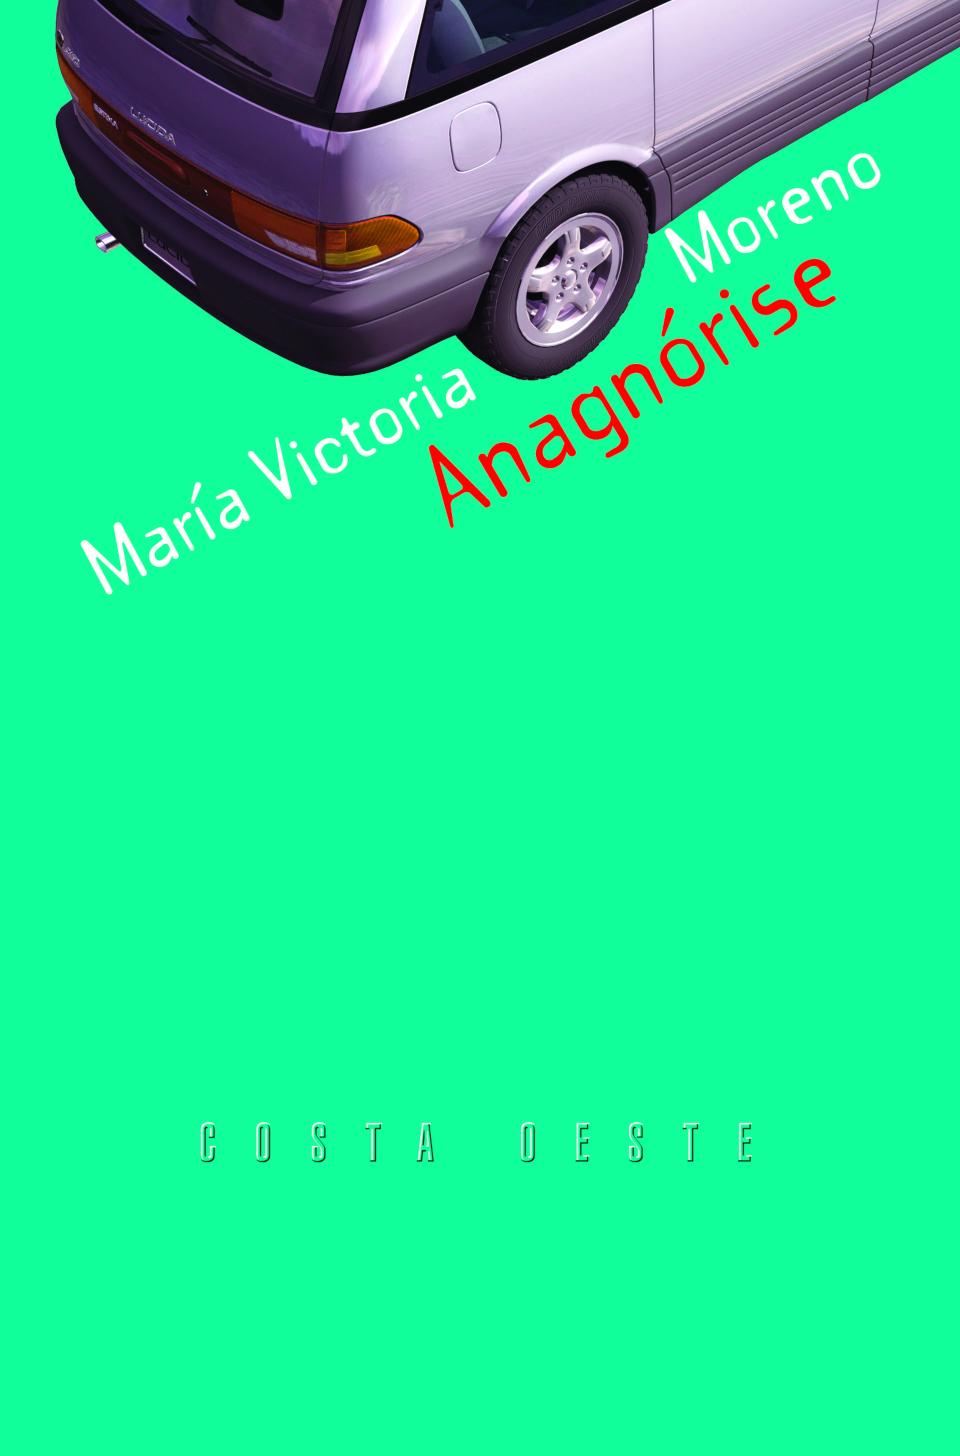 Escritoras galegas: Anagnórise, María Victoria Moreno